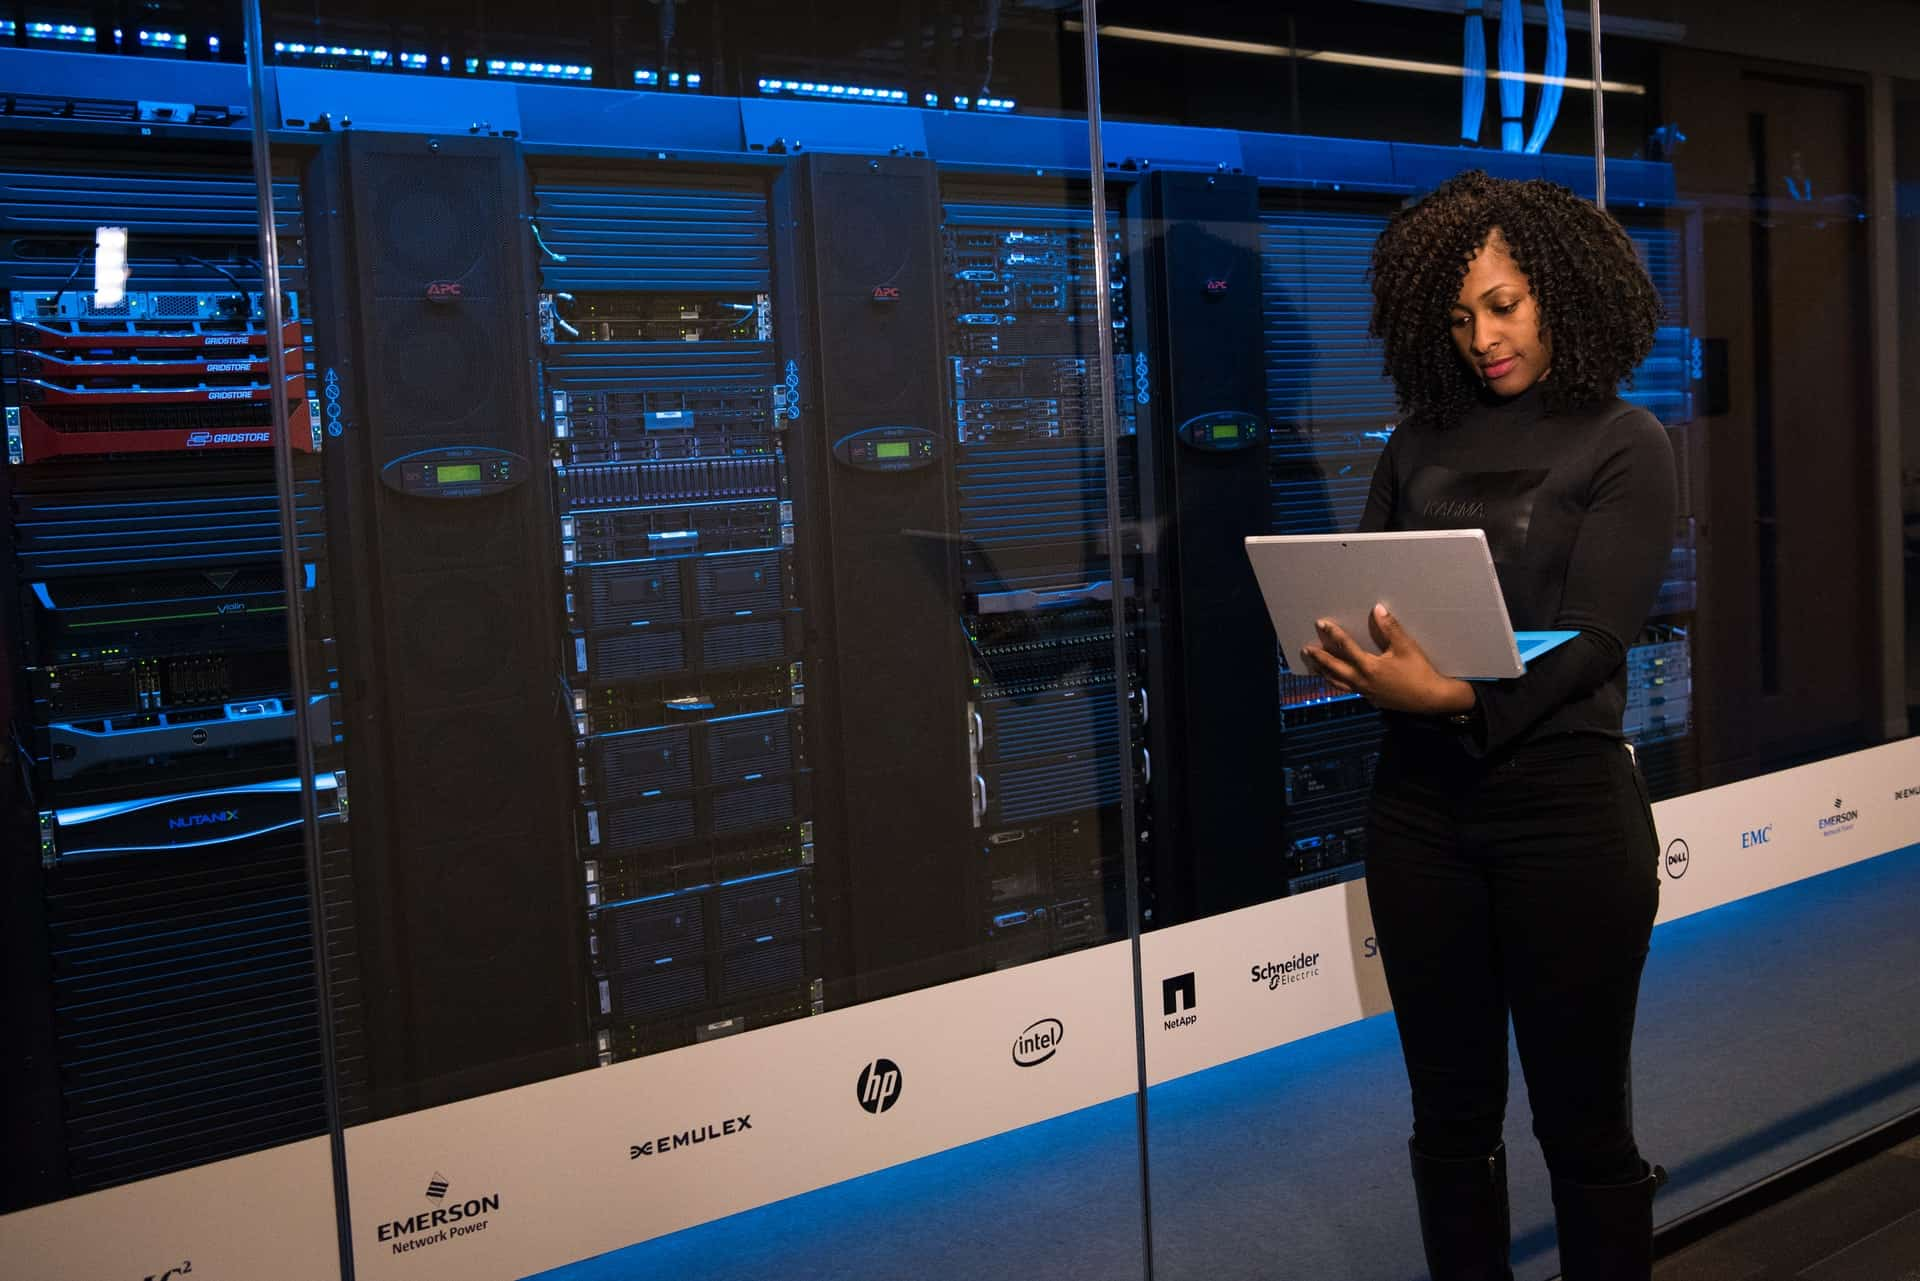 Woman standing in server room